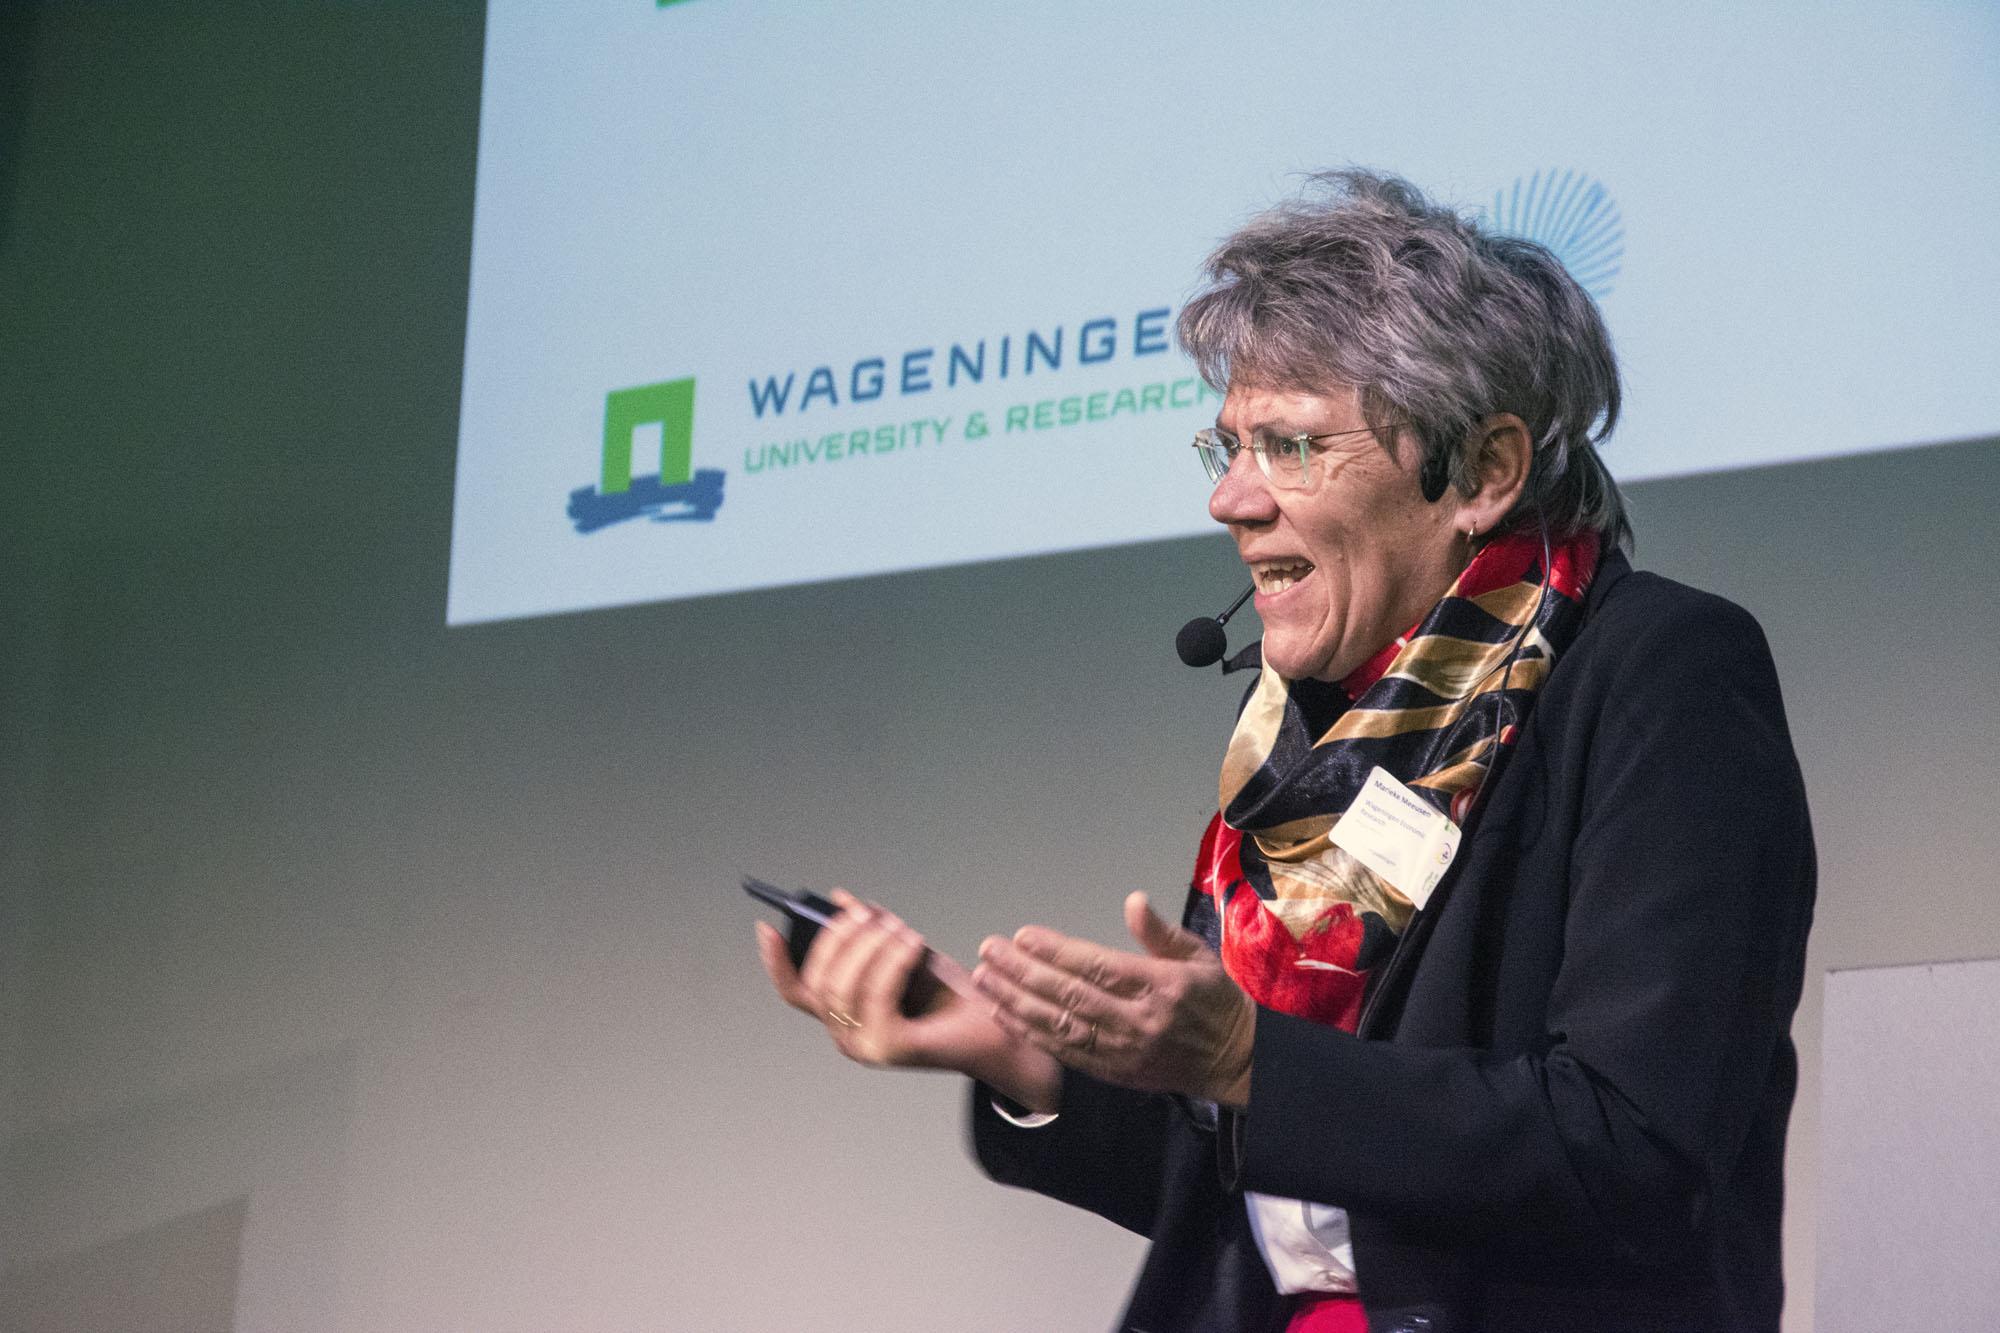 Marieke Meeusen